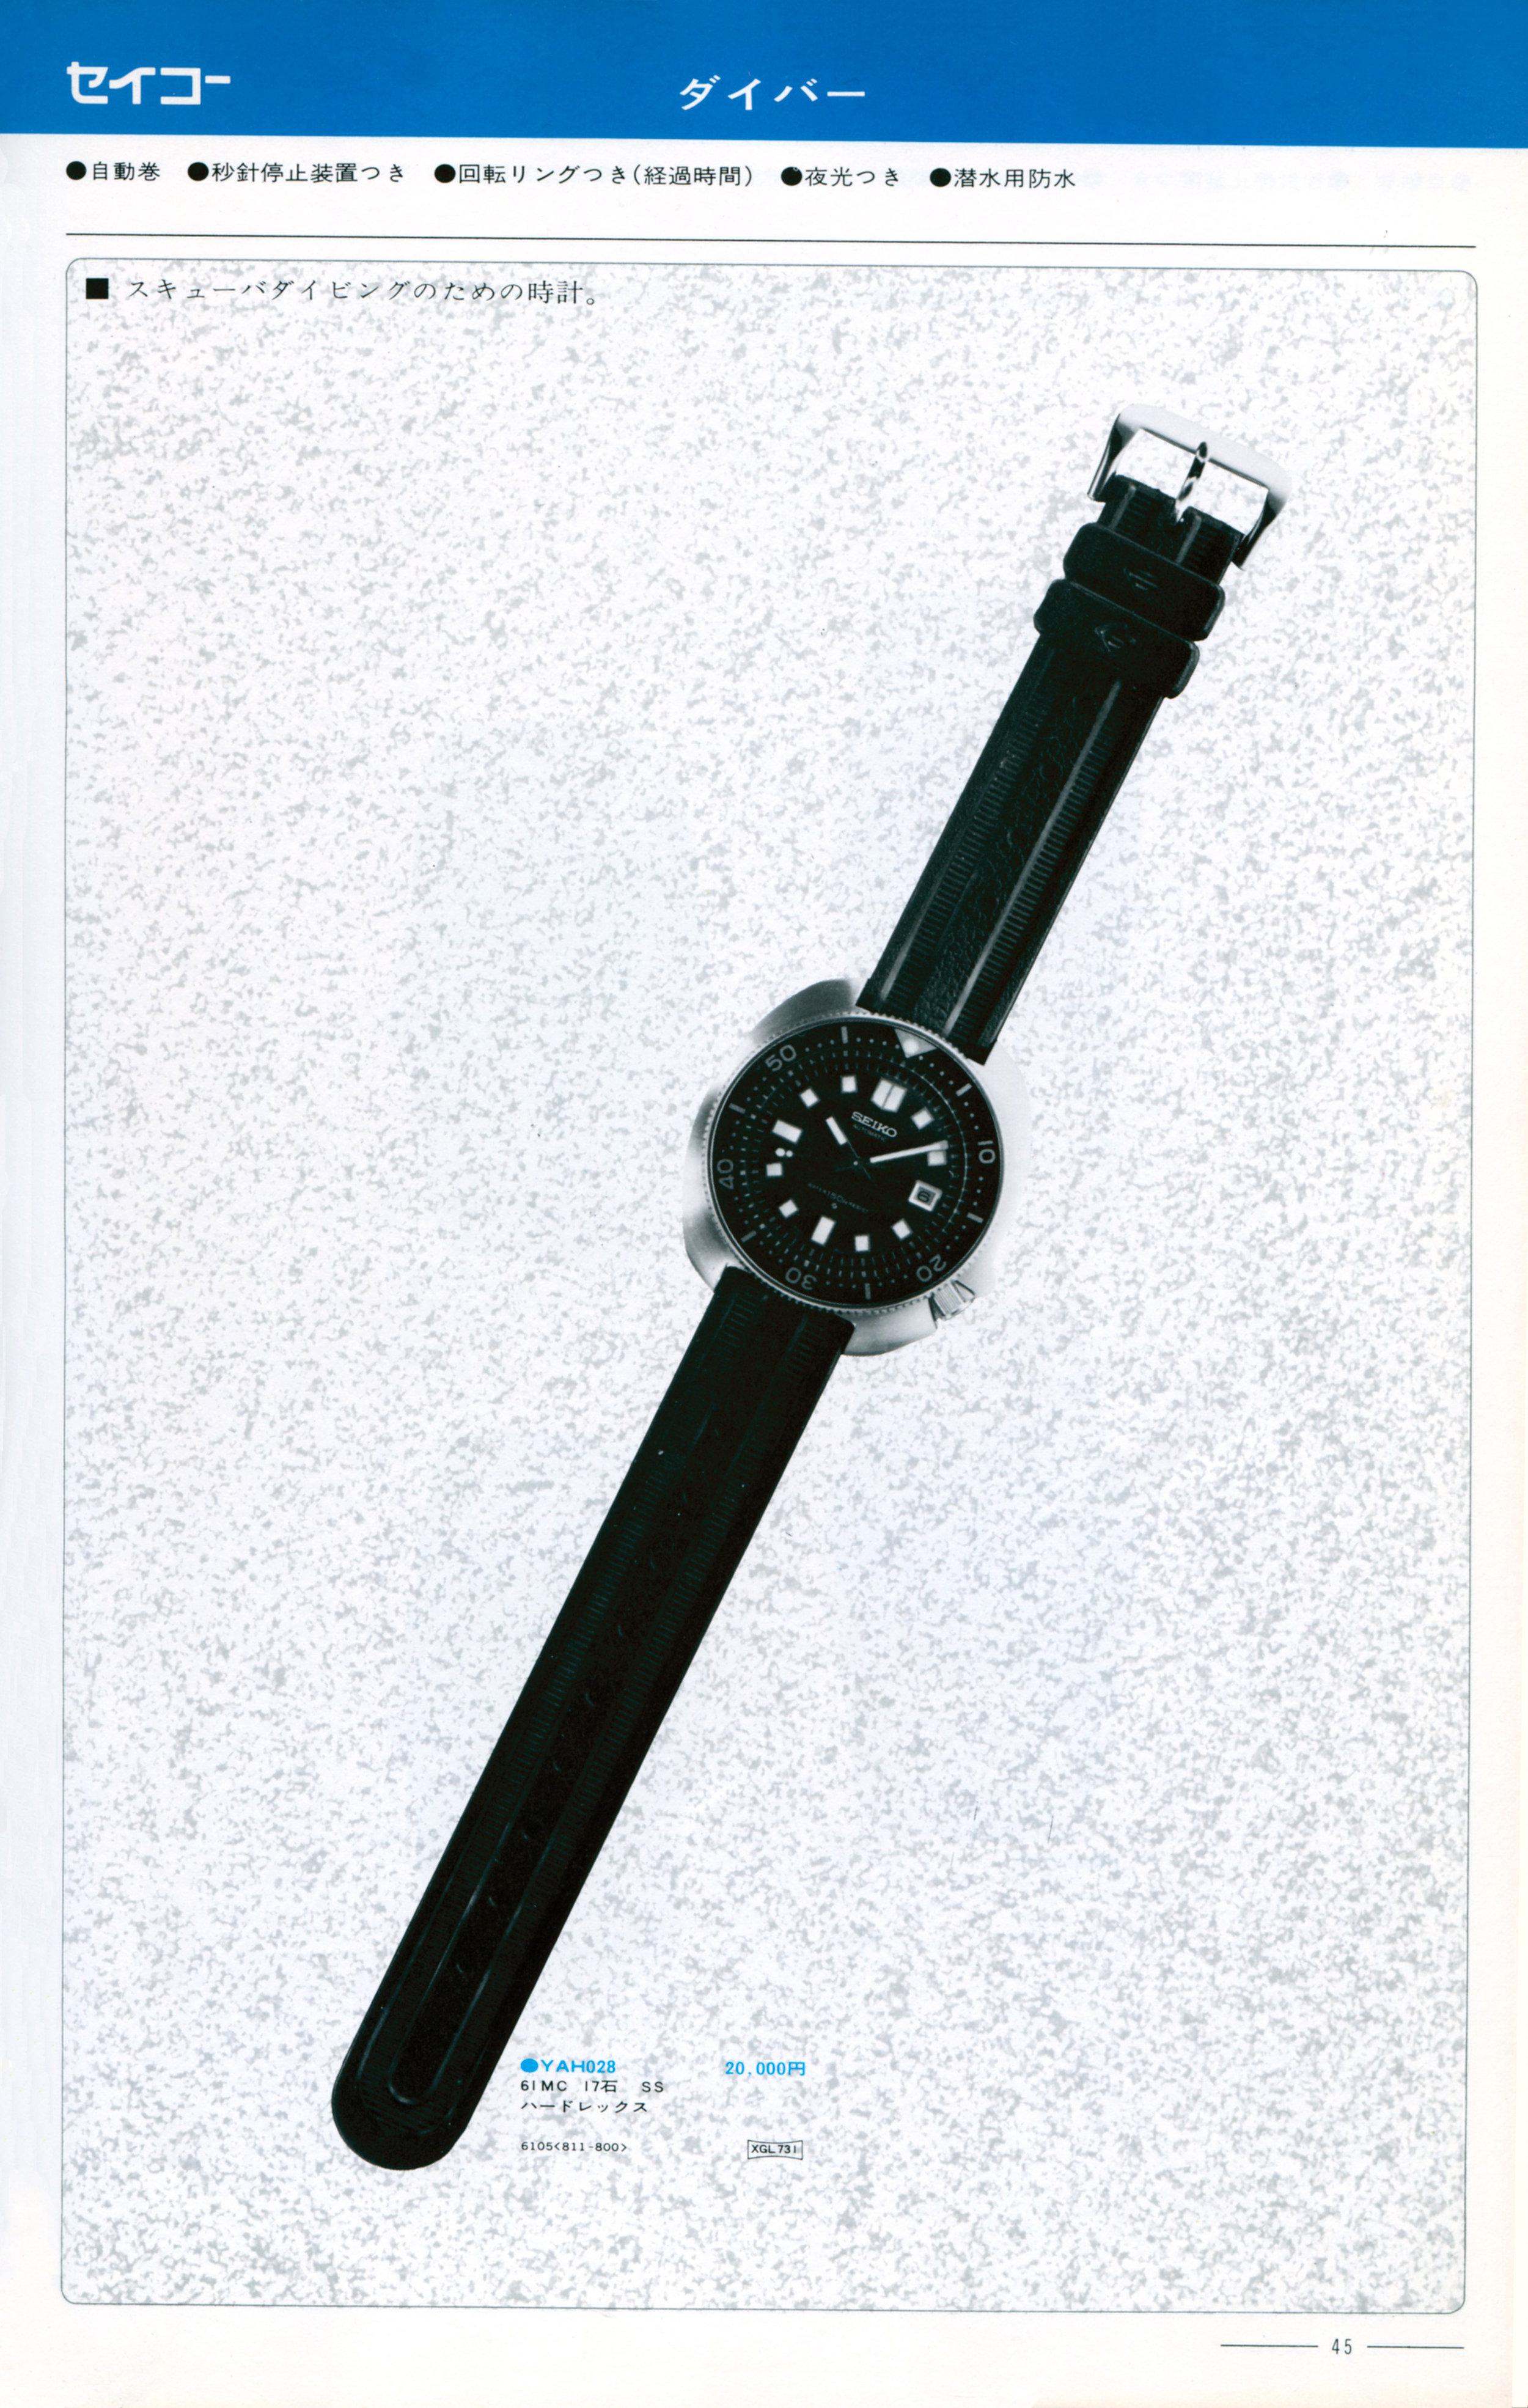 1976 Vol.1 Seiko JDM Catalog